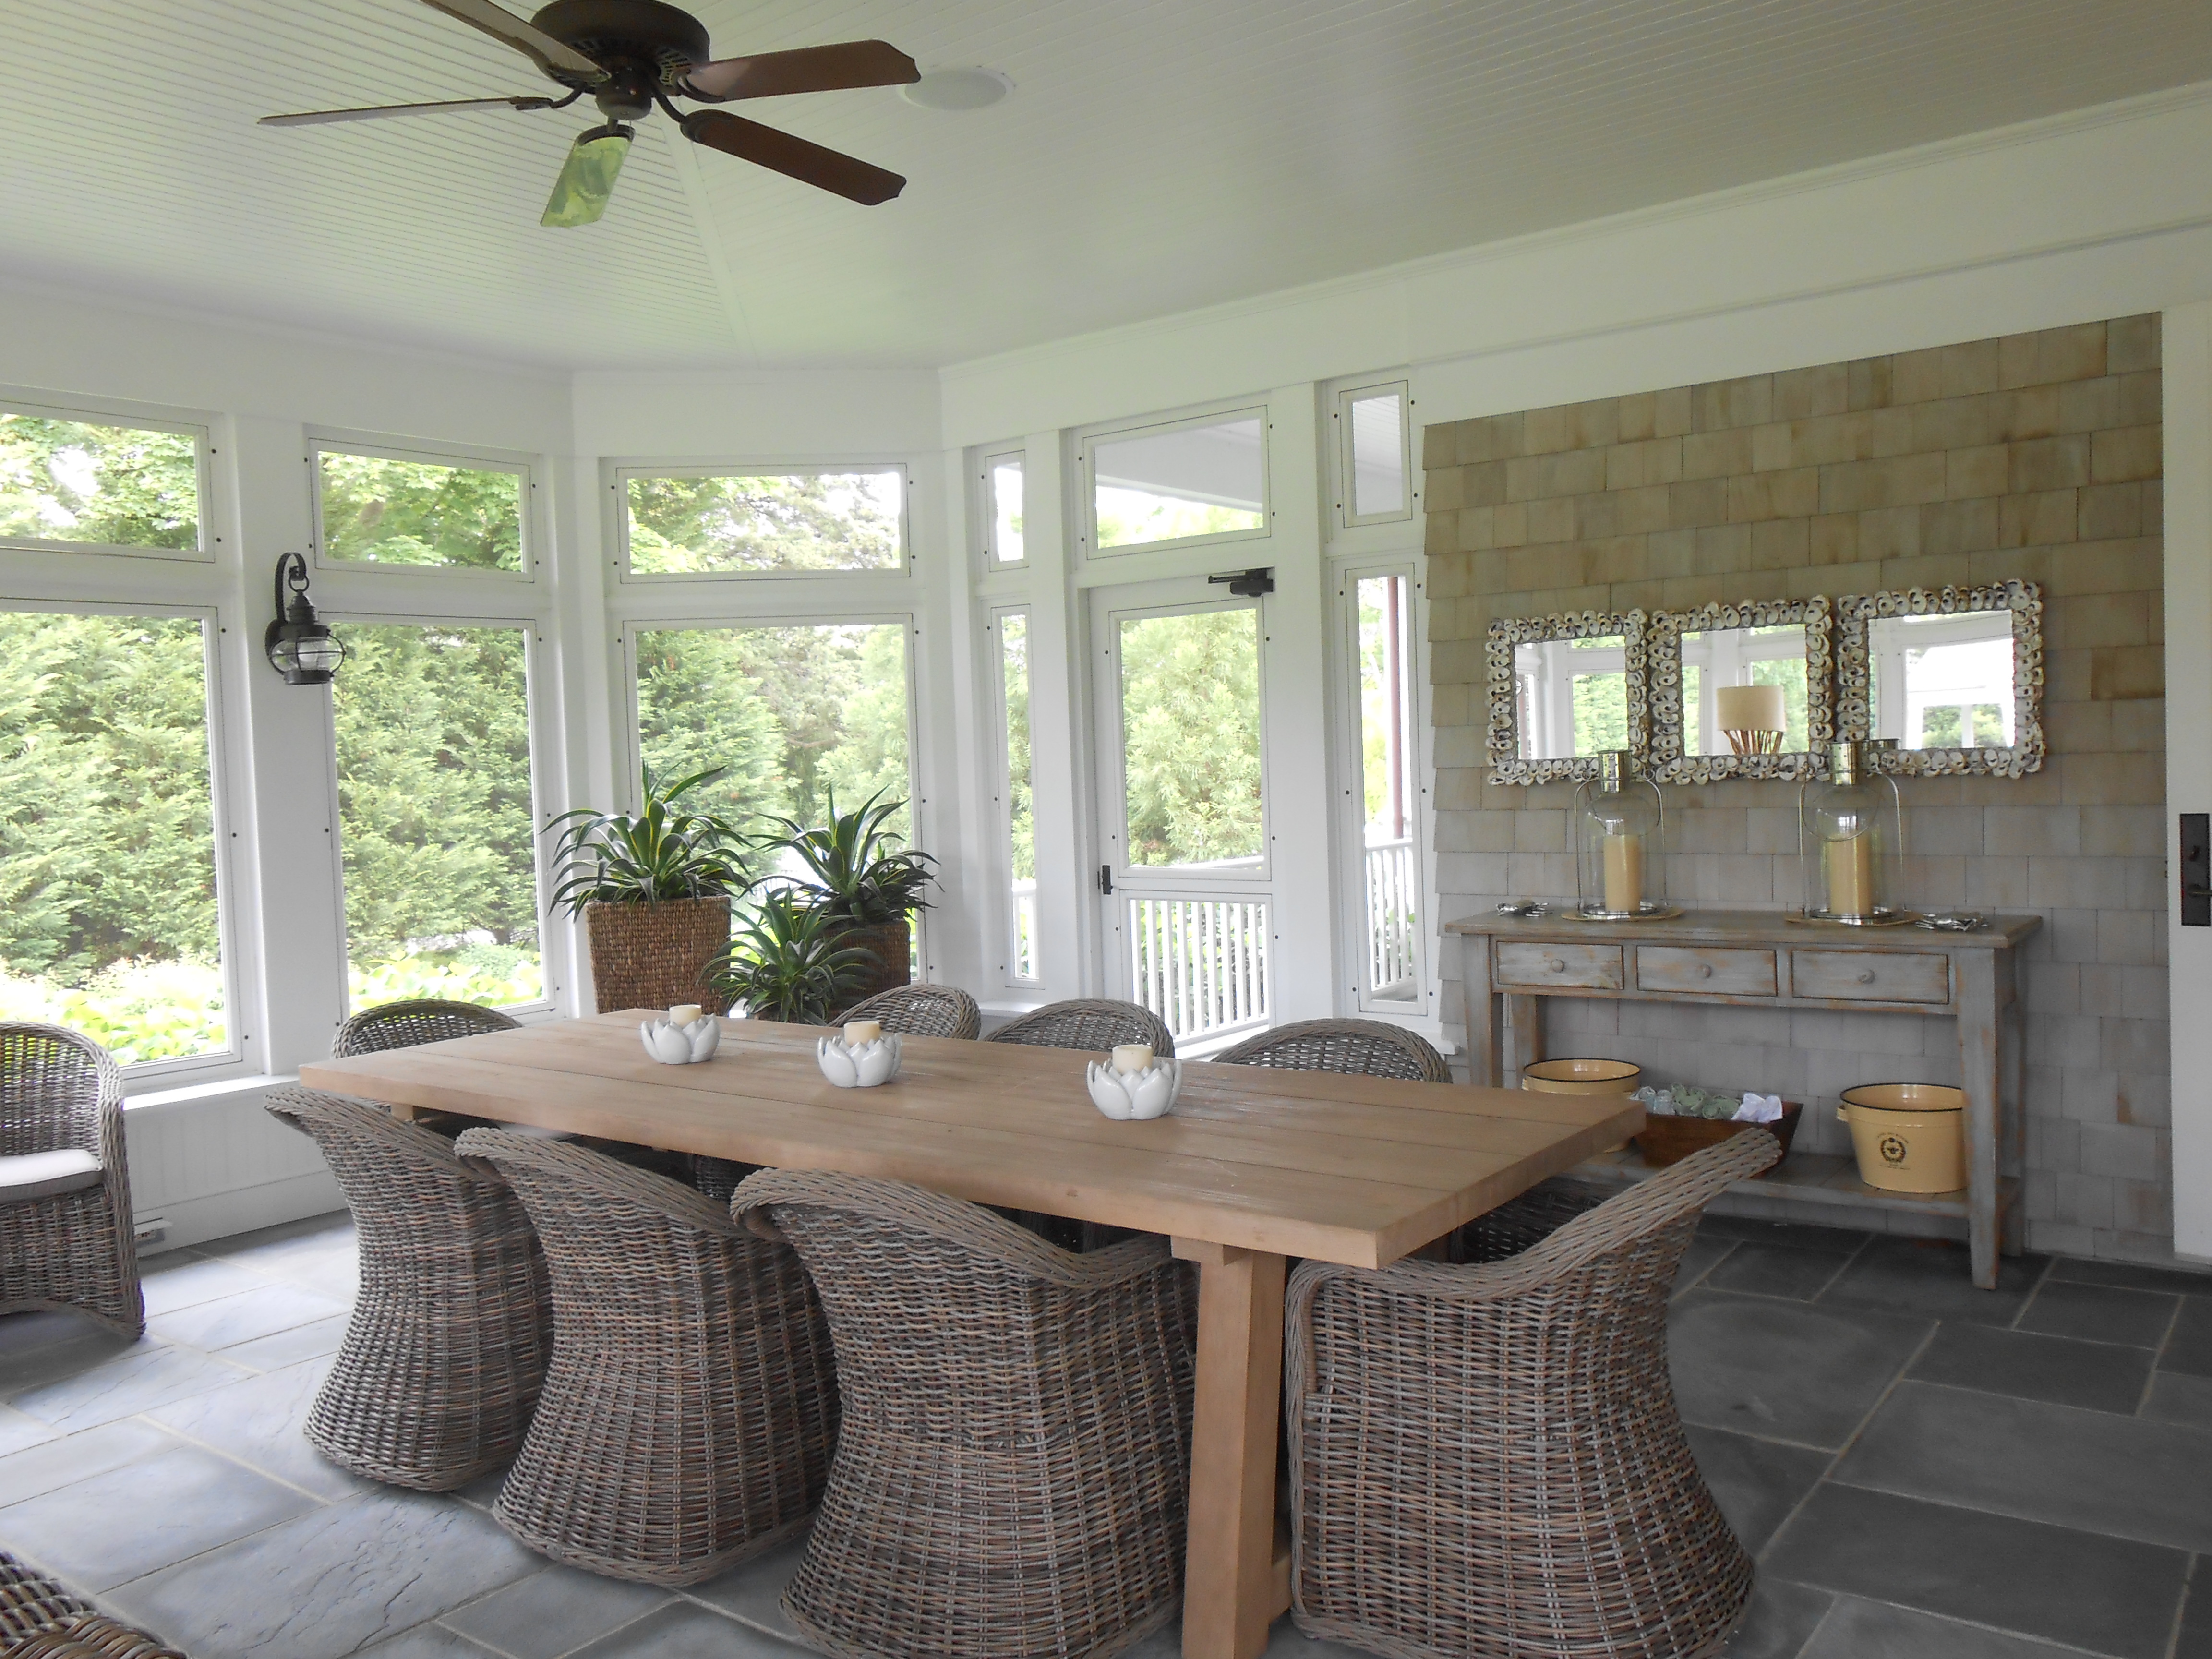 Ralph lauren toni sabatino style for Sunroom dining room ideas